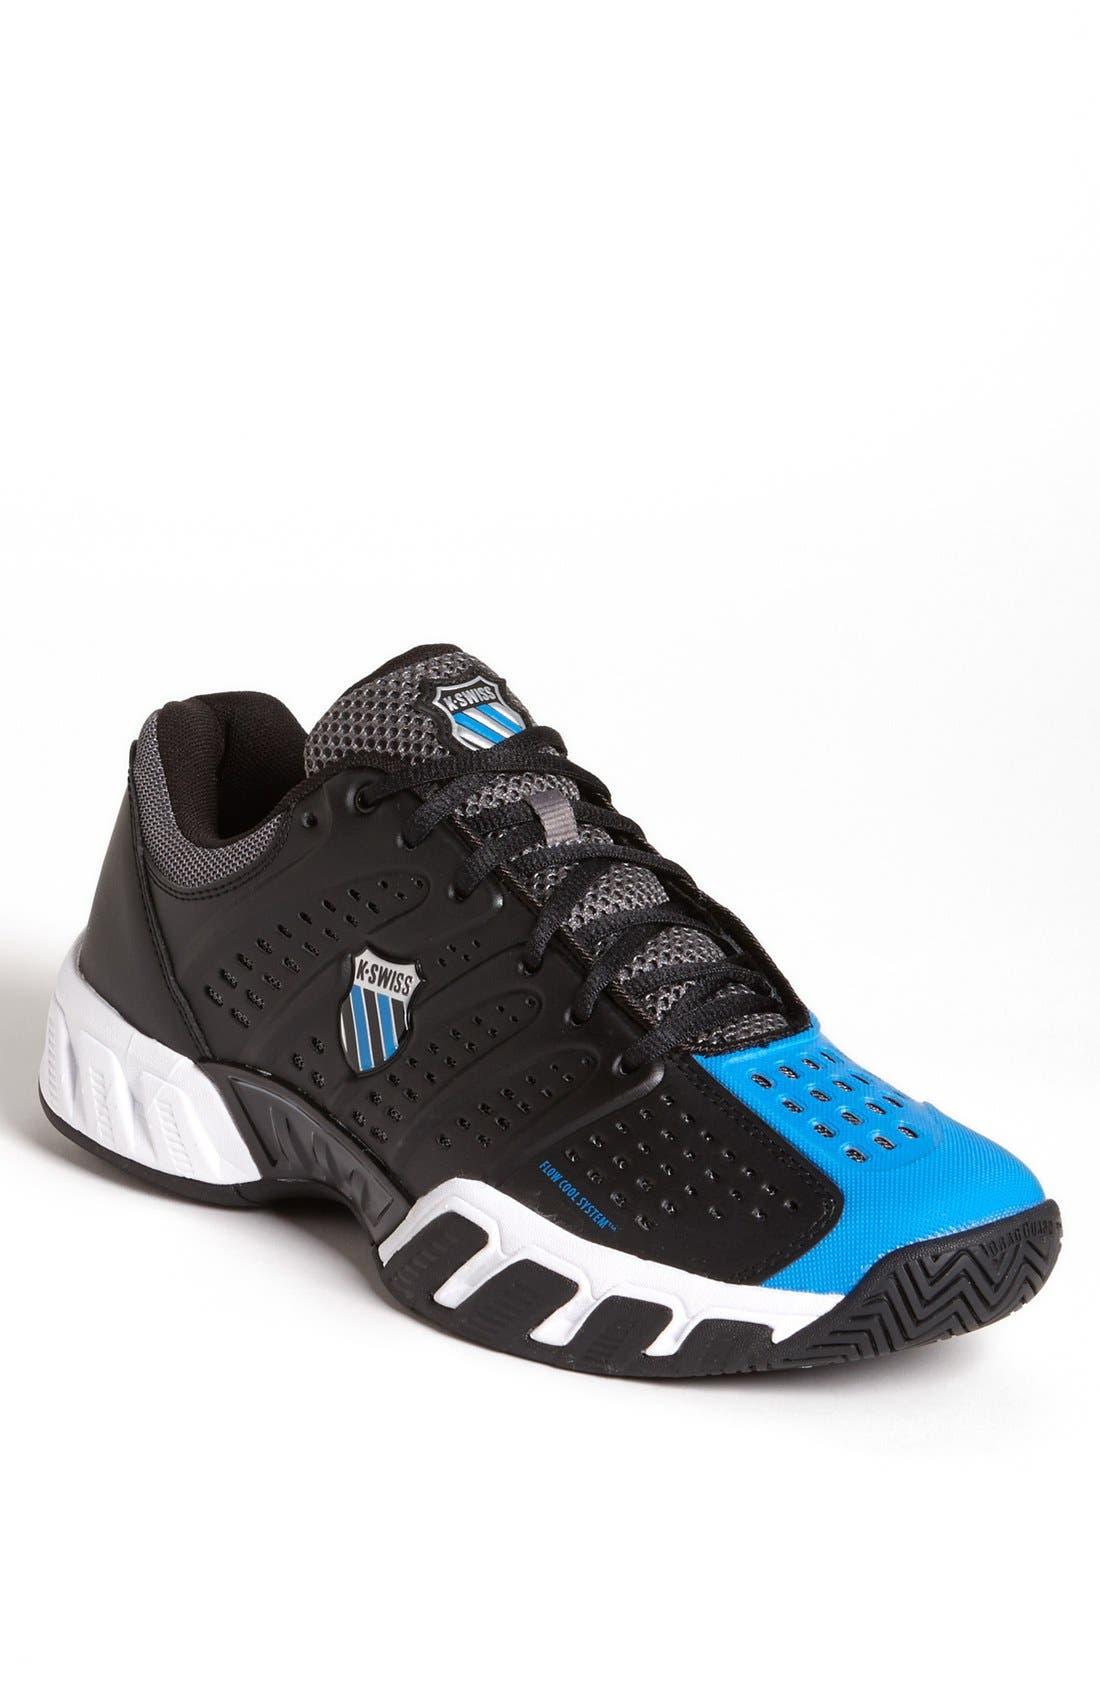 Alternate Image 1 Selected - K-Swiss 'Big Shot Light' Tennis Shoe (Men)